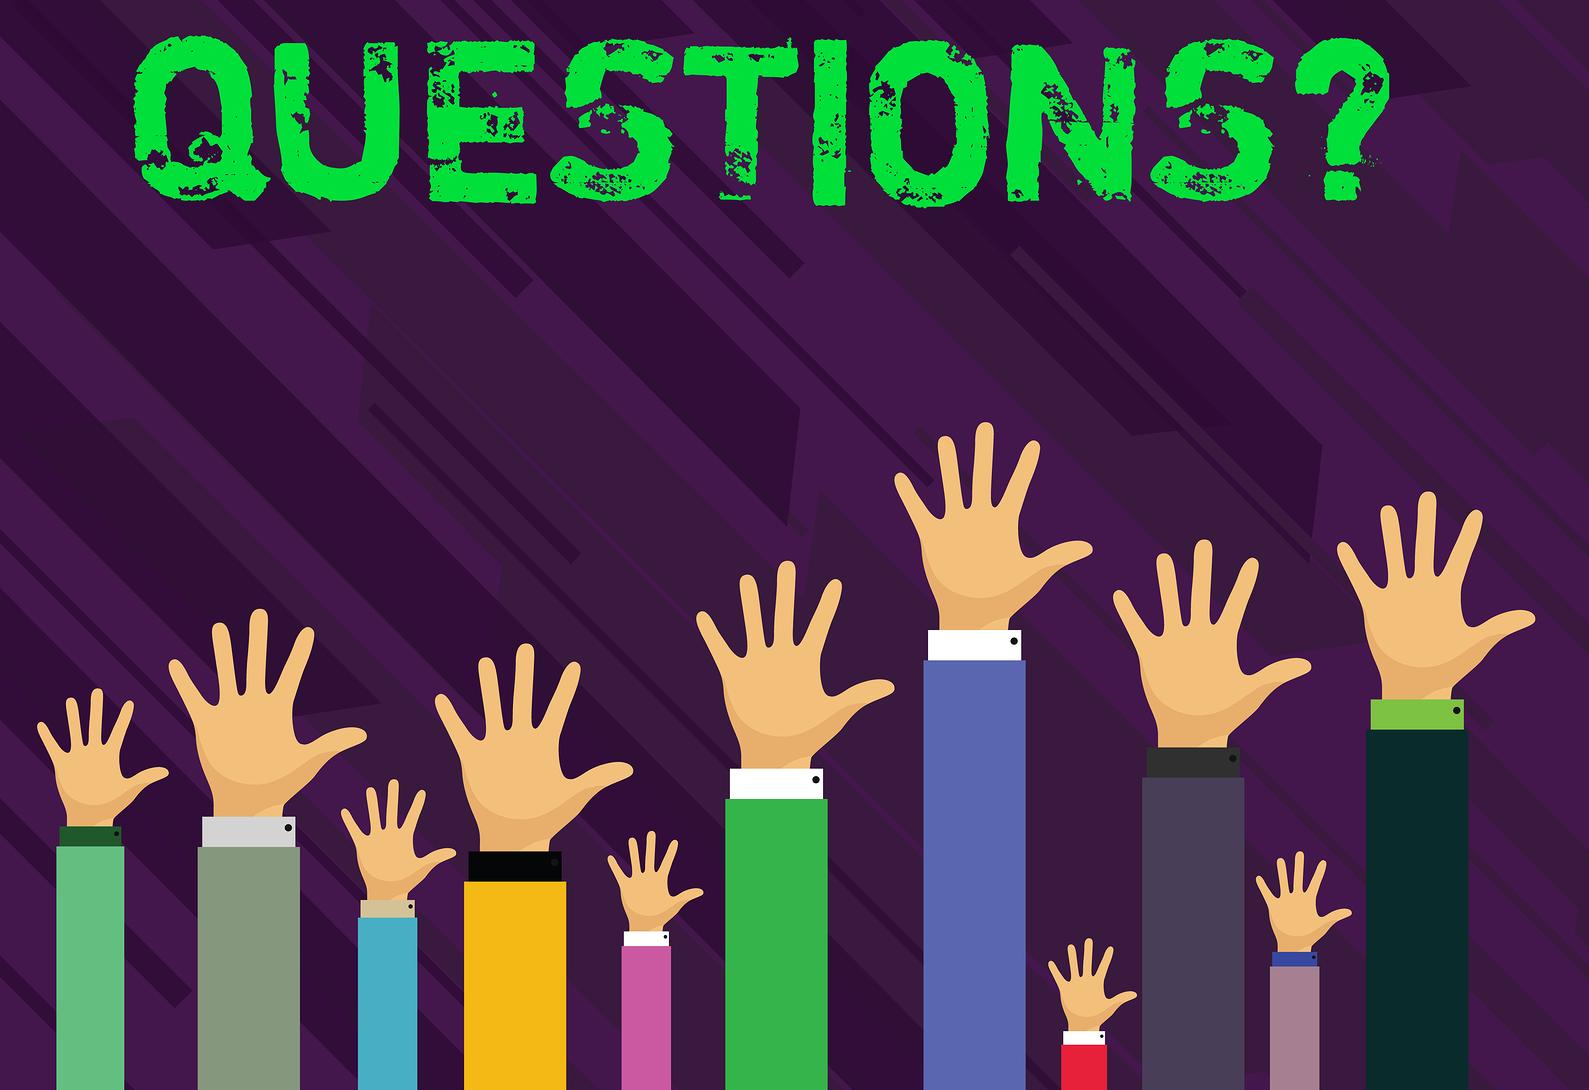 10. questions